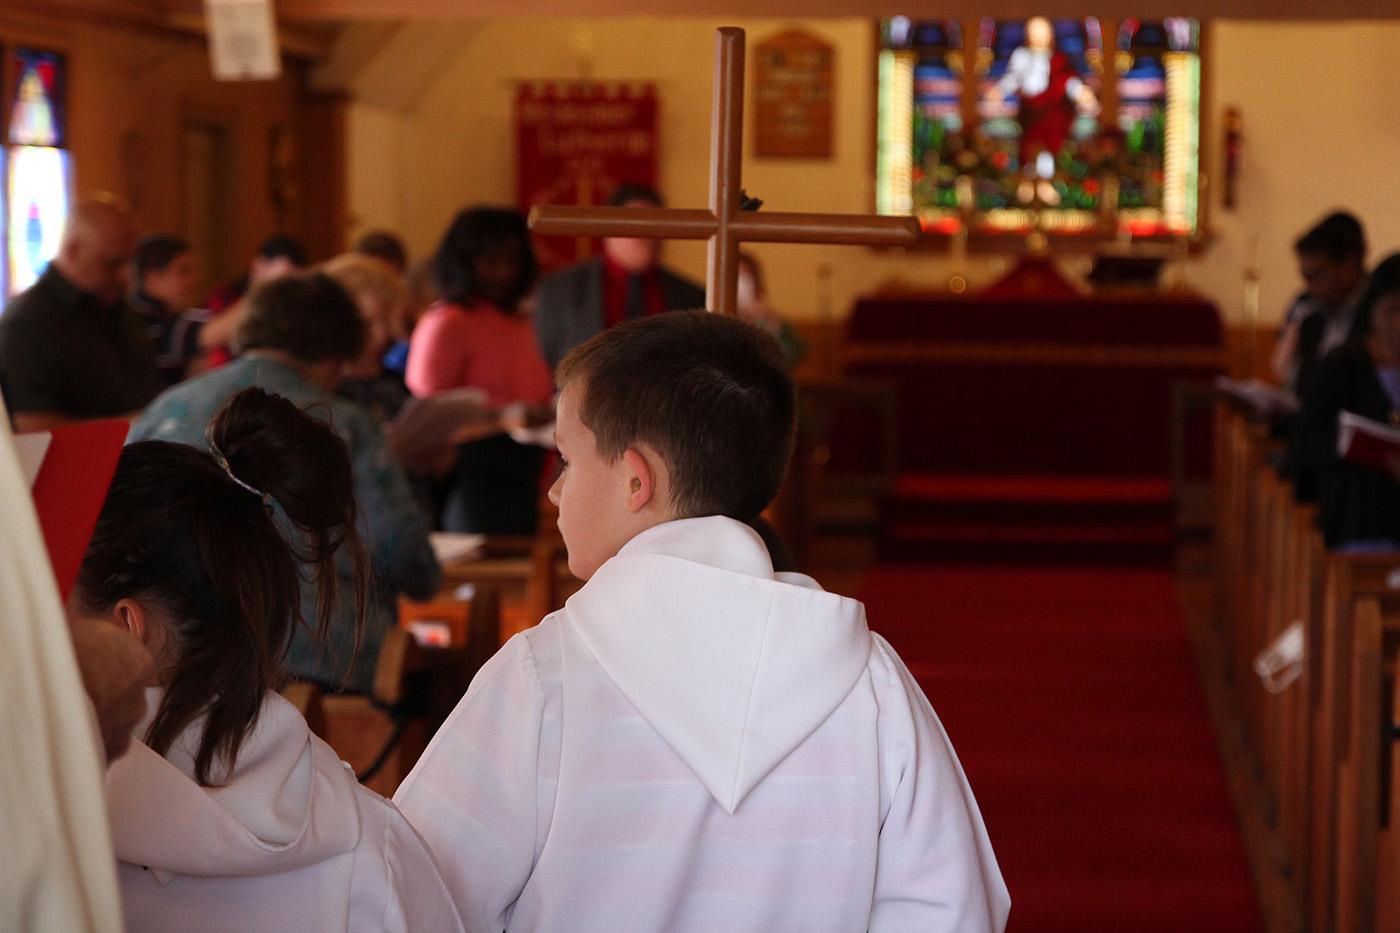 Worship Service at Redeemer